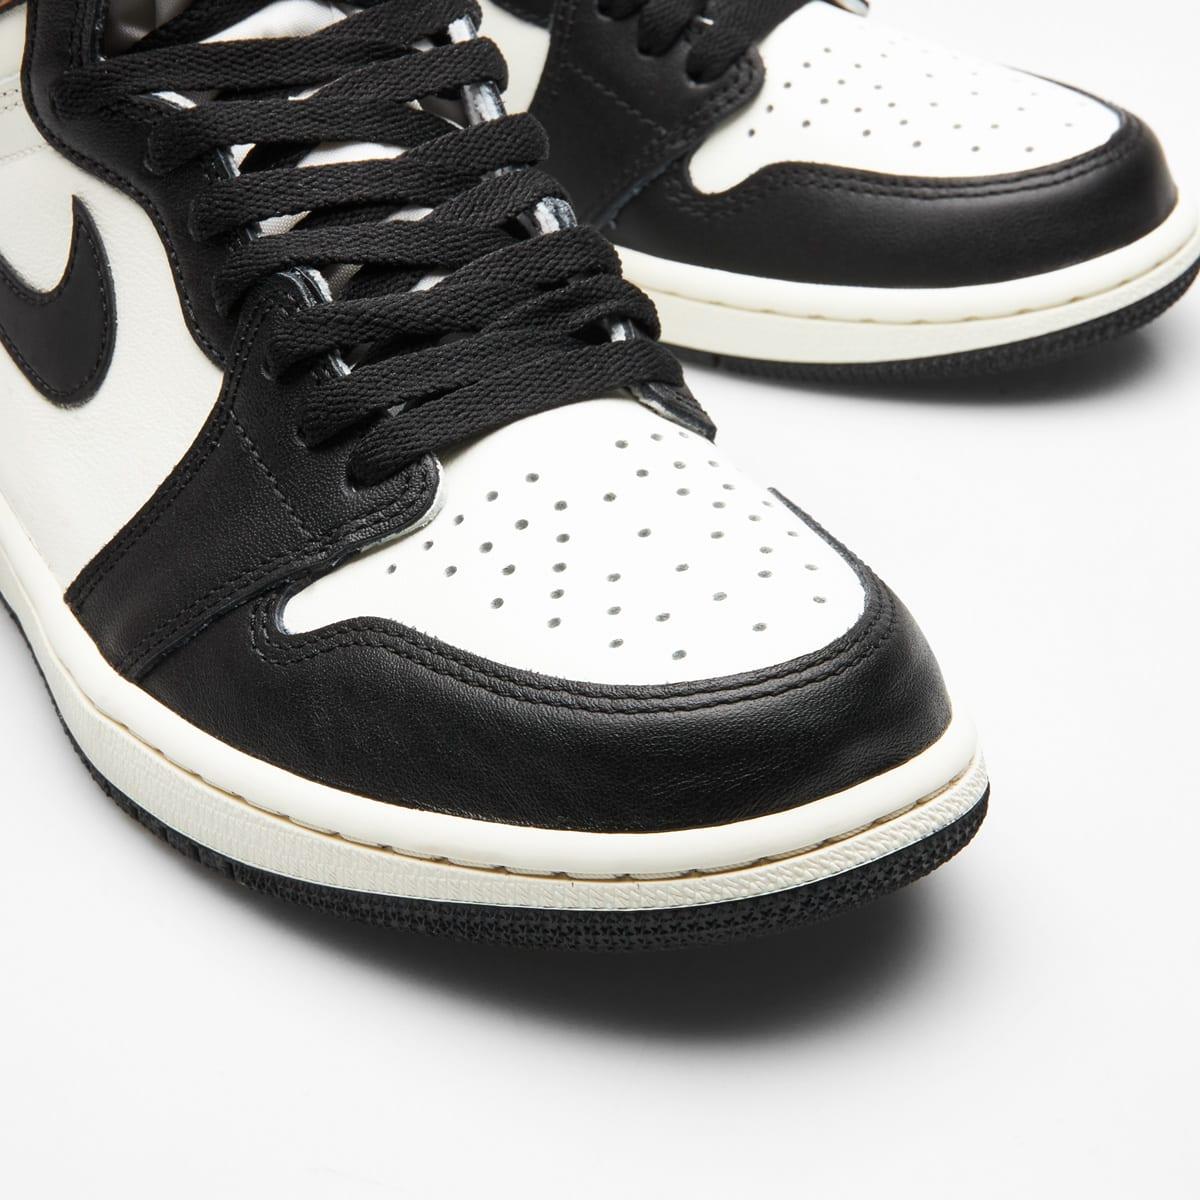 "Air Jordan 1 Hi OG Retro ""Dark Mocha"" - 555088-105"